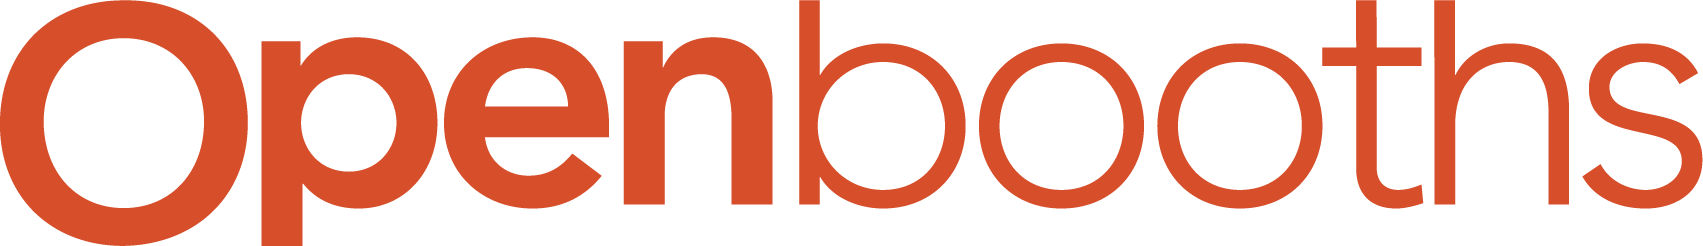 Openbooths Logo